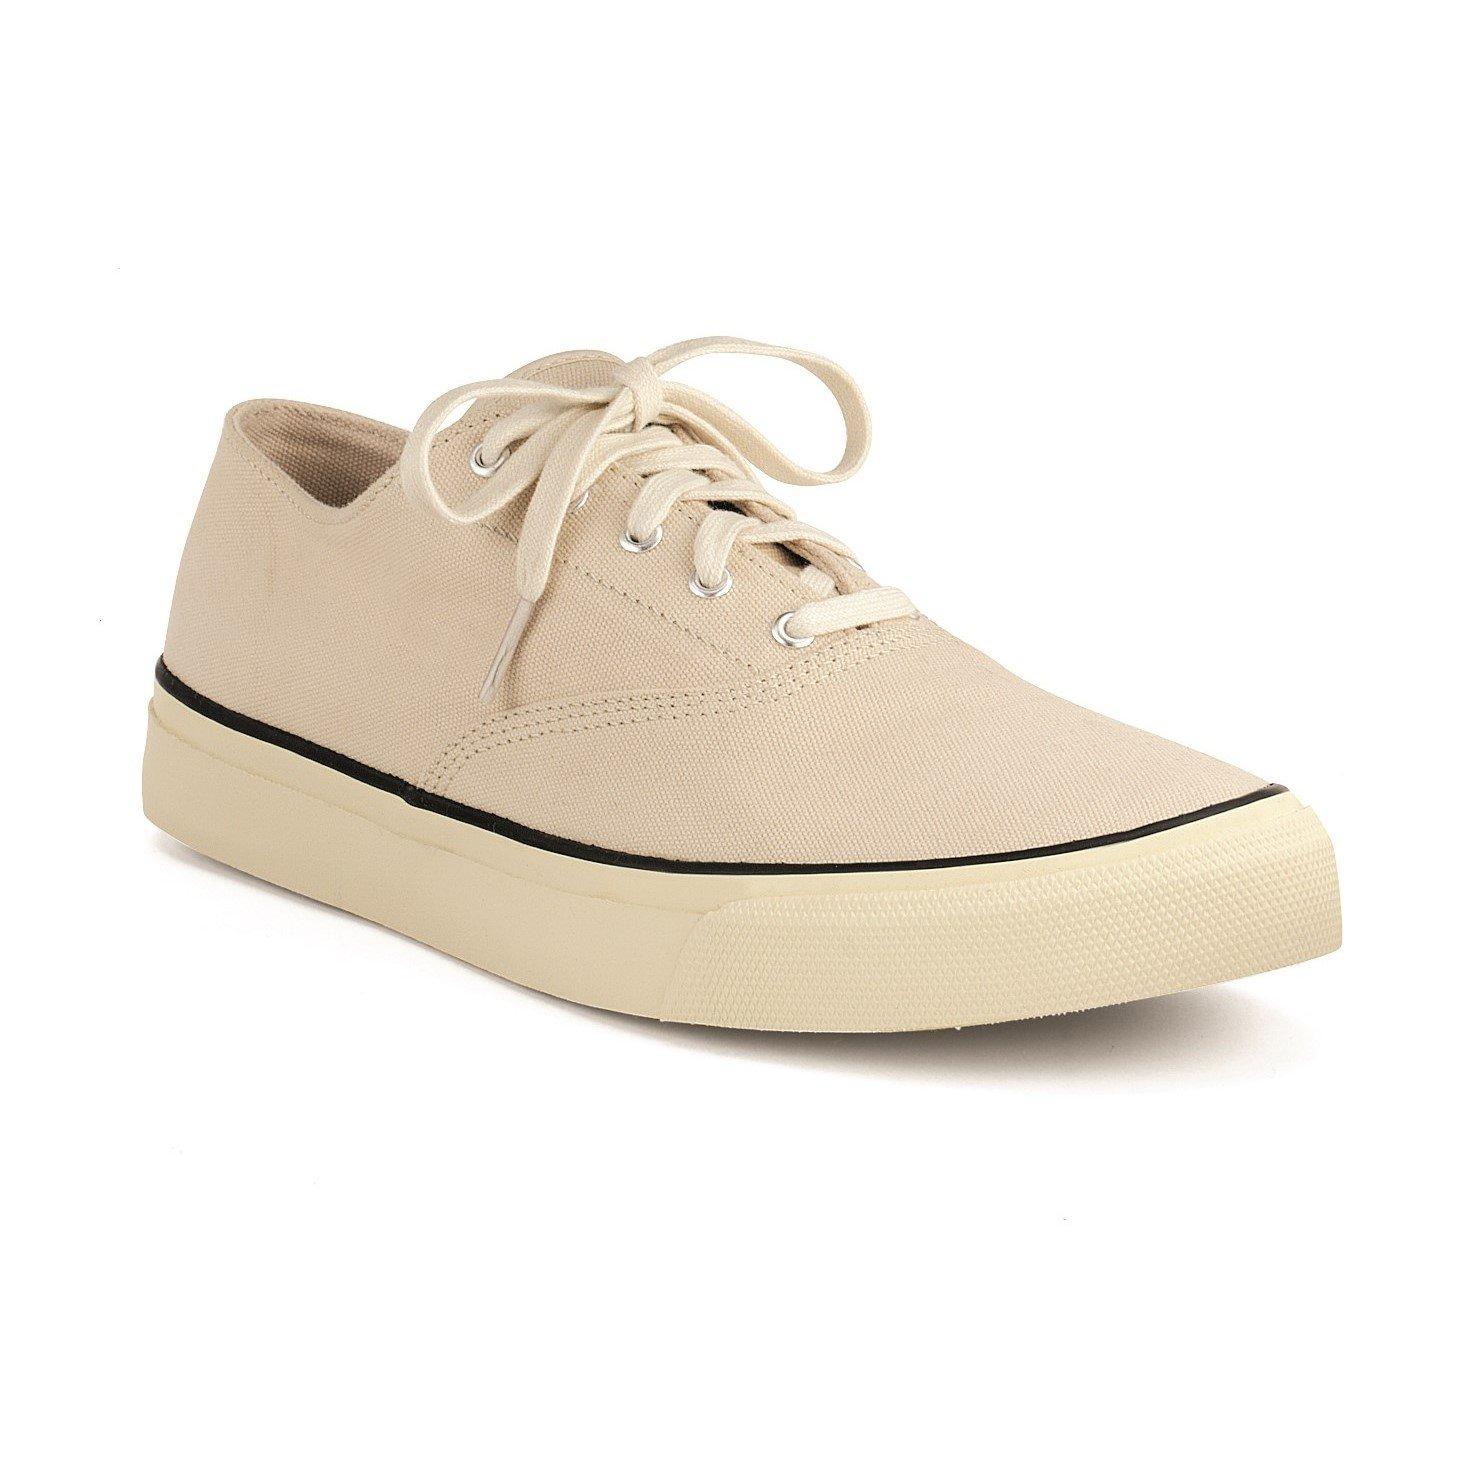 Sperry Men's Cloud CVO Boat Shoe Various Colours 33537 - White 9